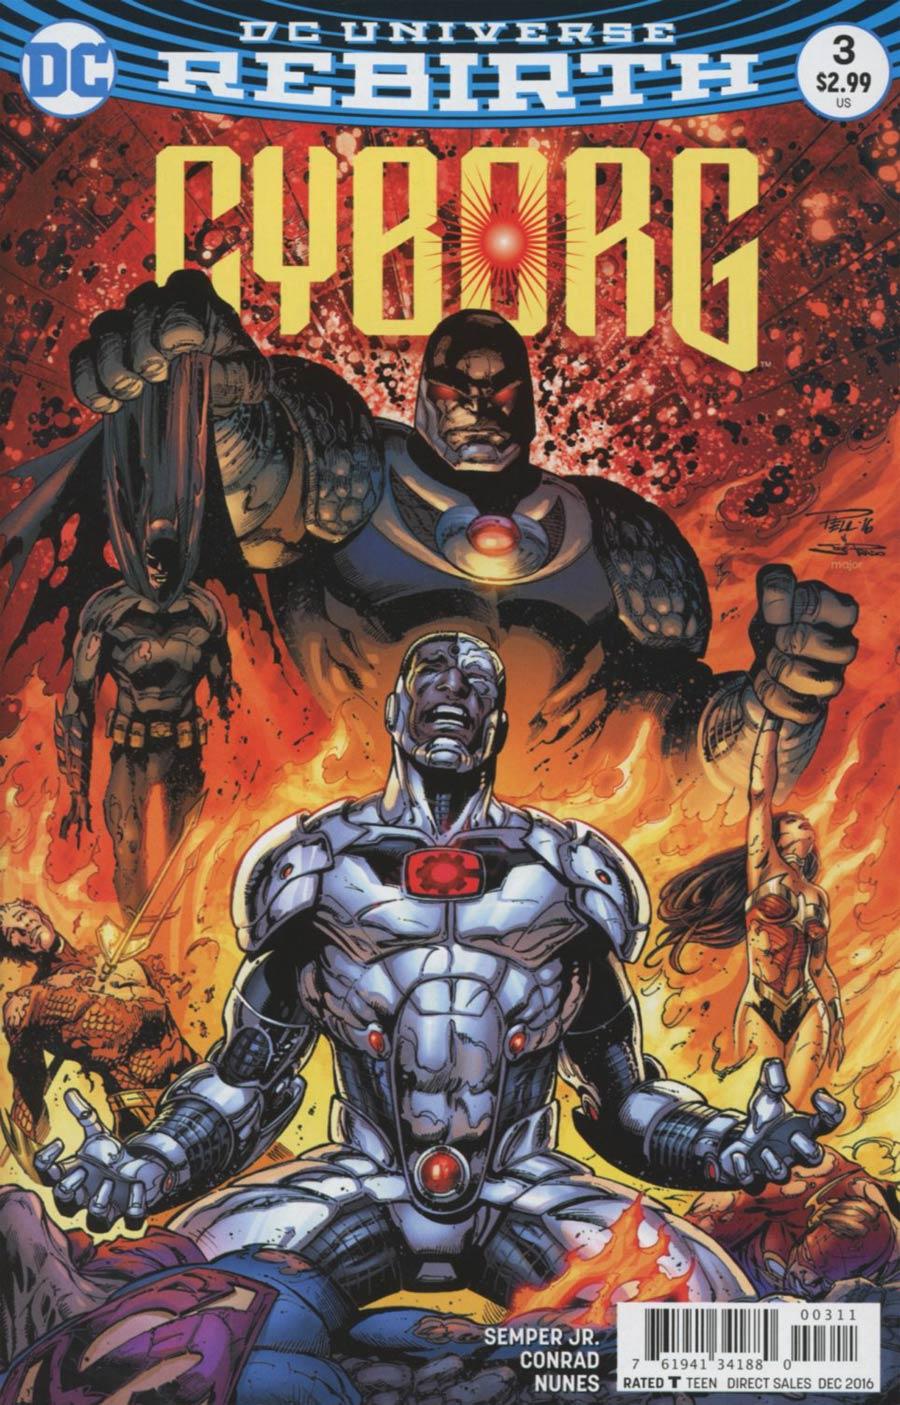 Cyborg Vol 2 #3 Cover A Regular Paul Pelletier Cover